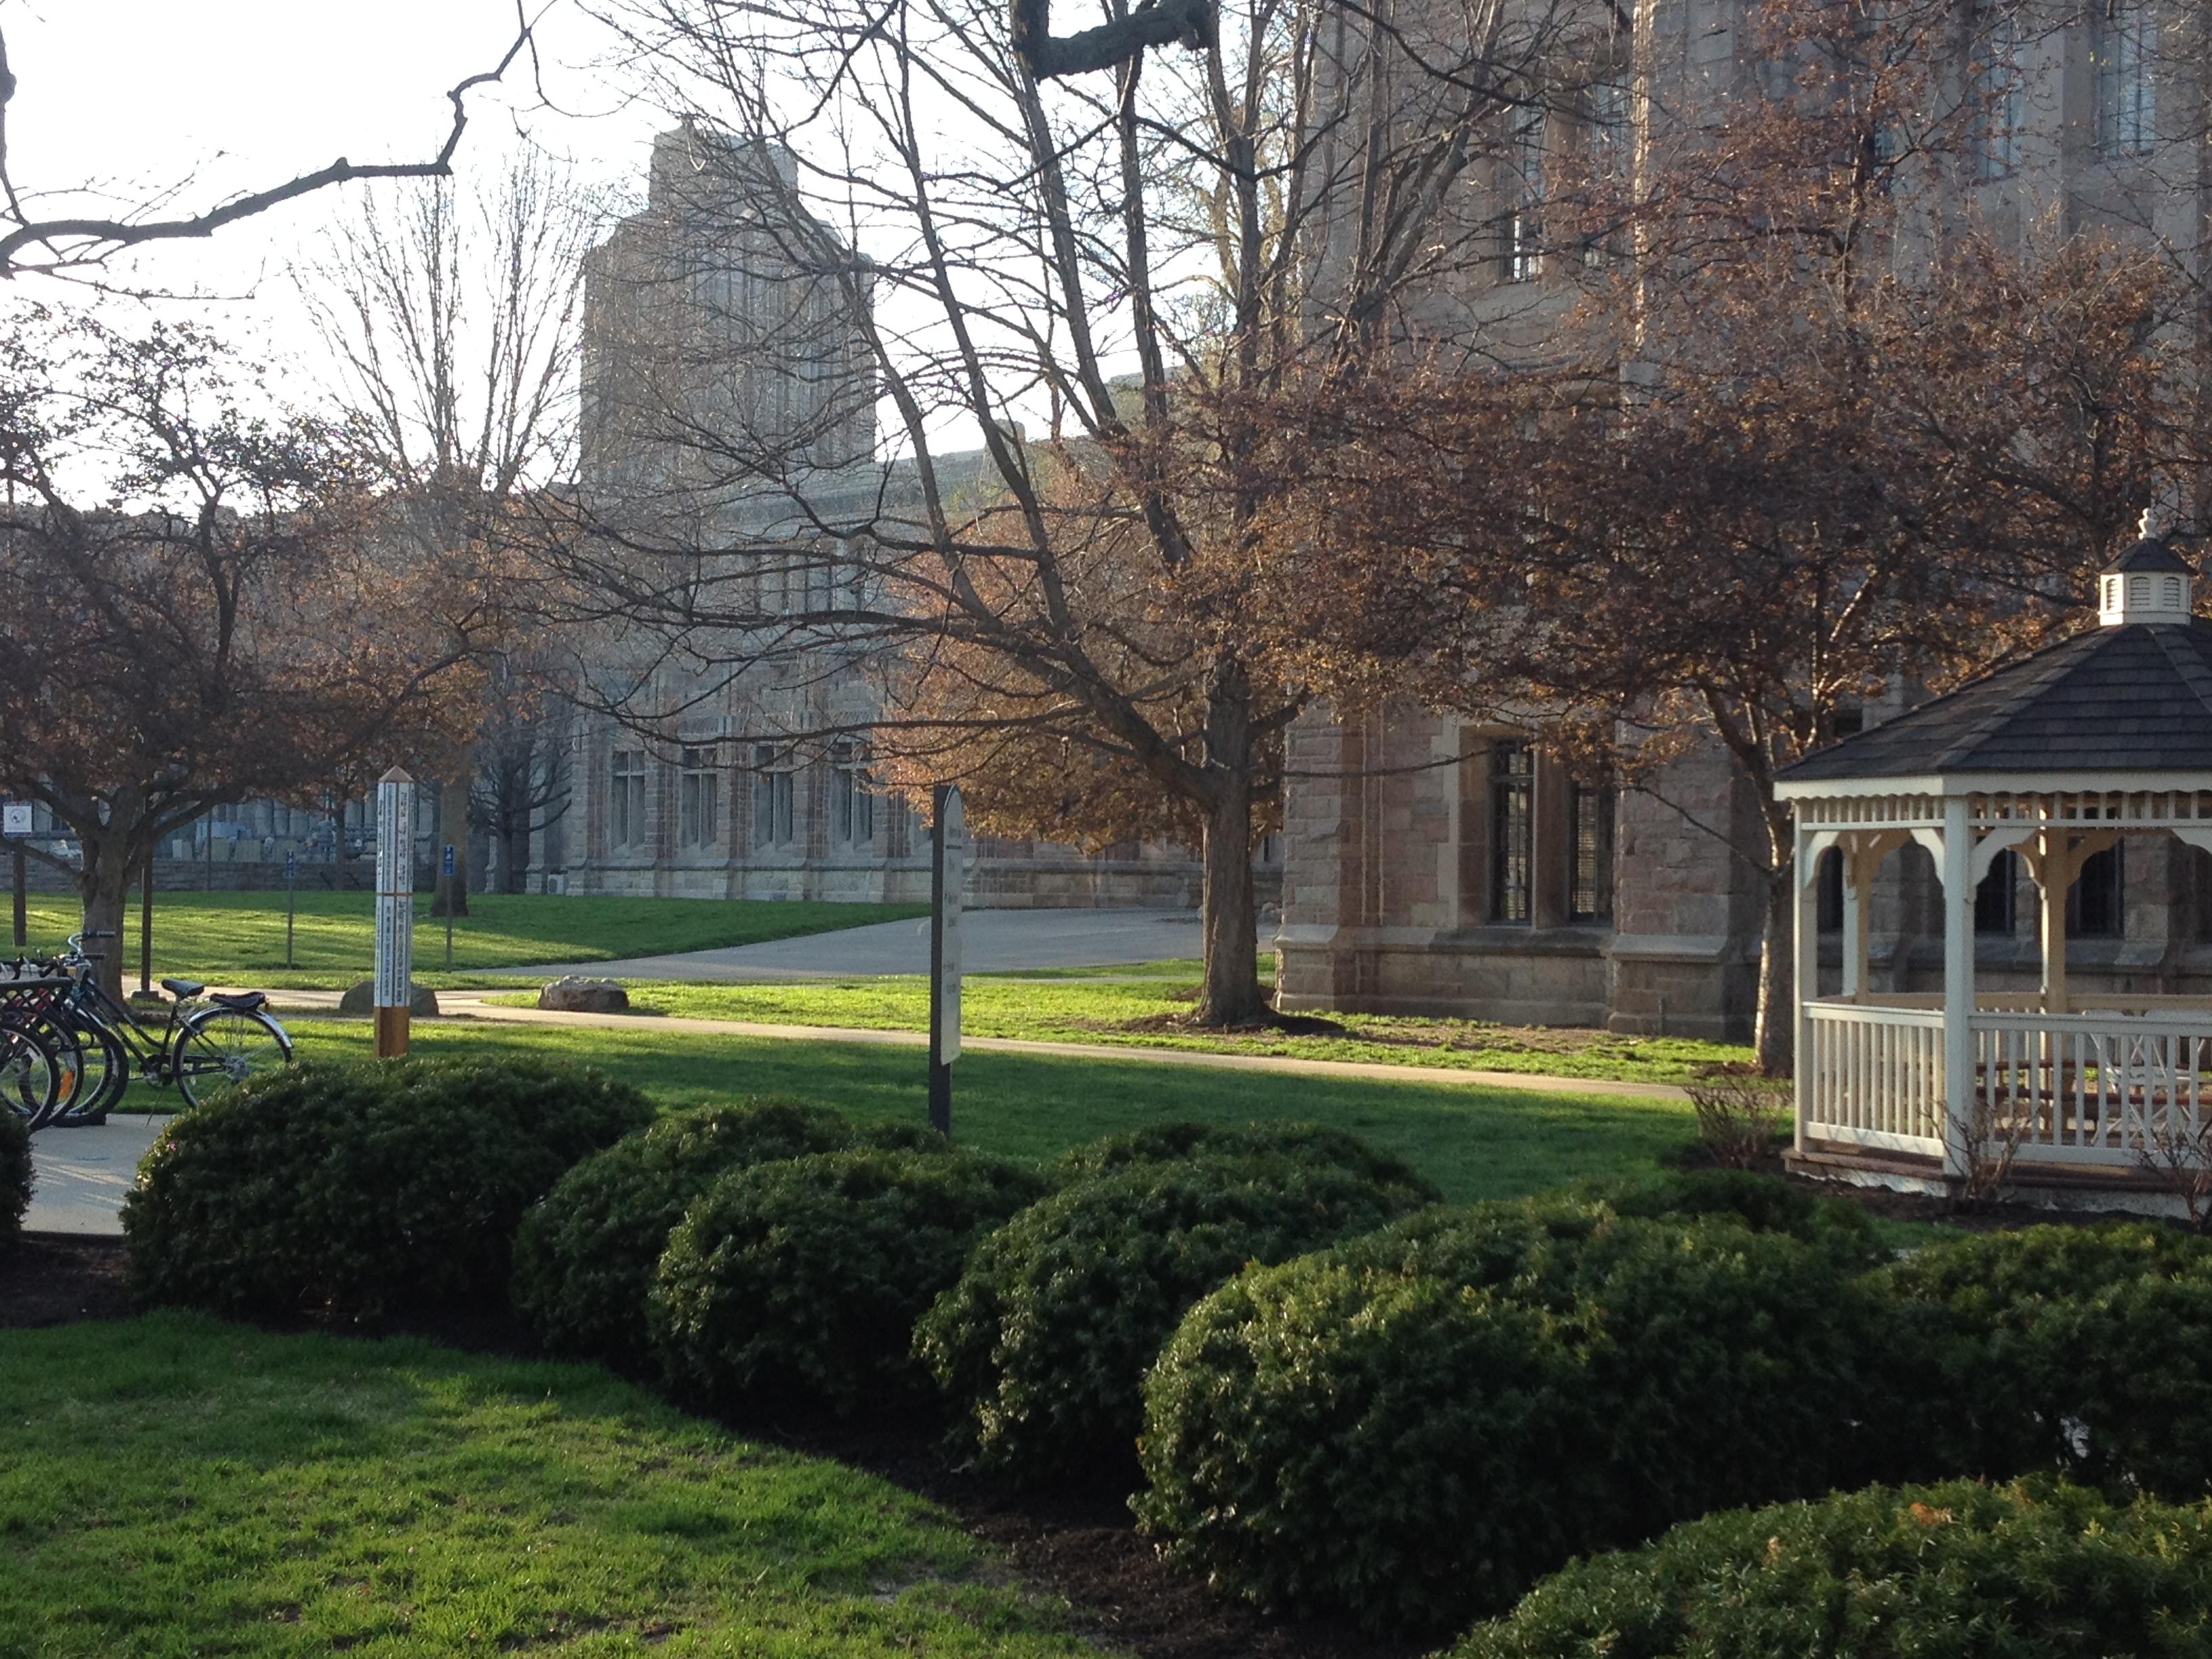 Bringing Civic Education Back to Campus